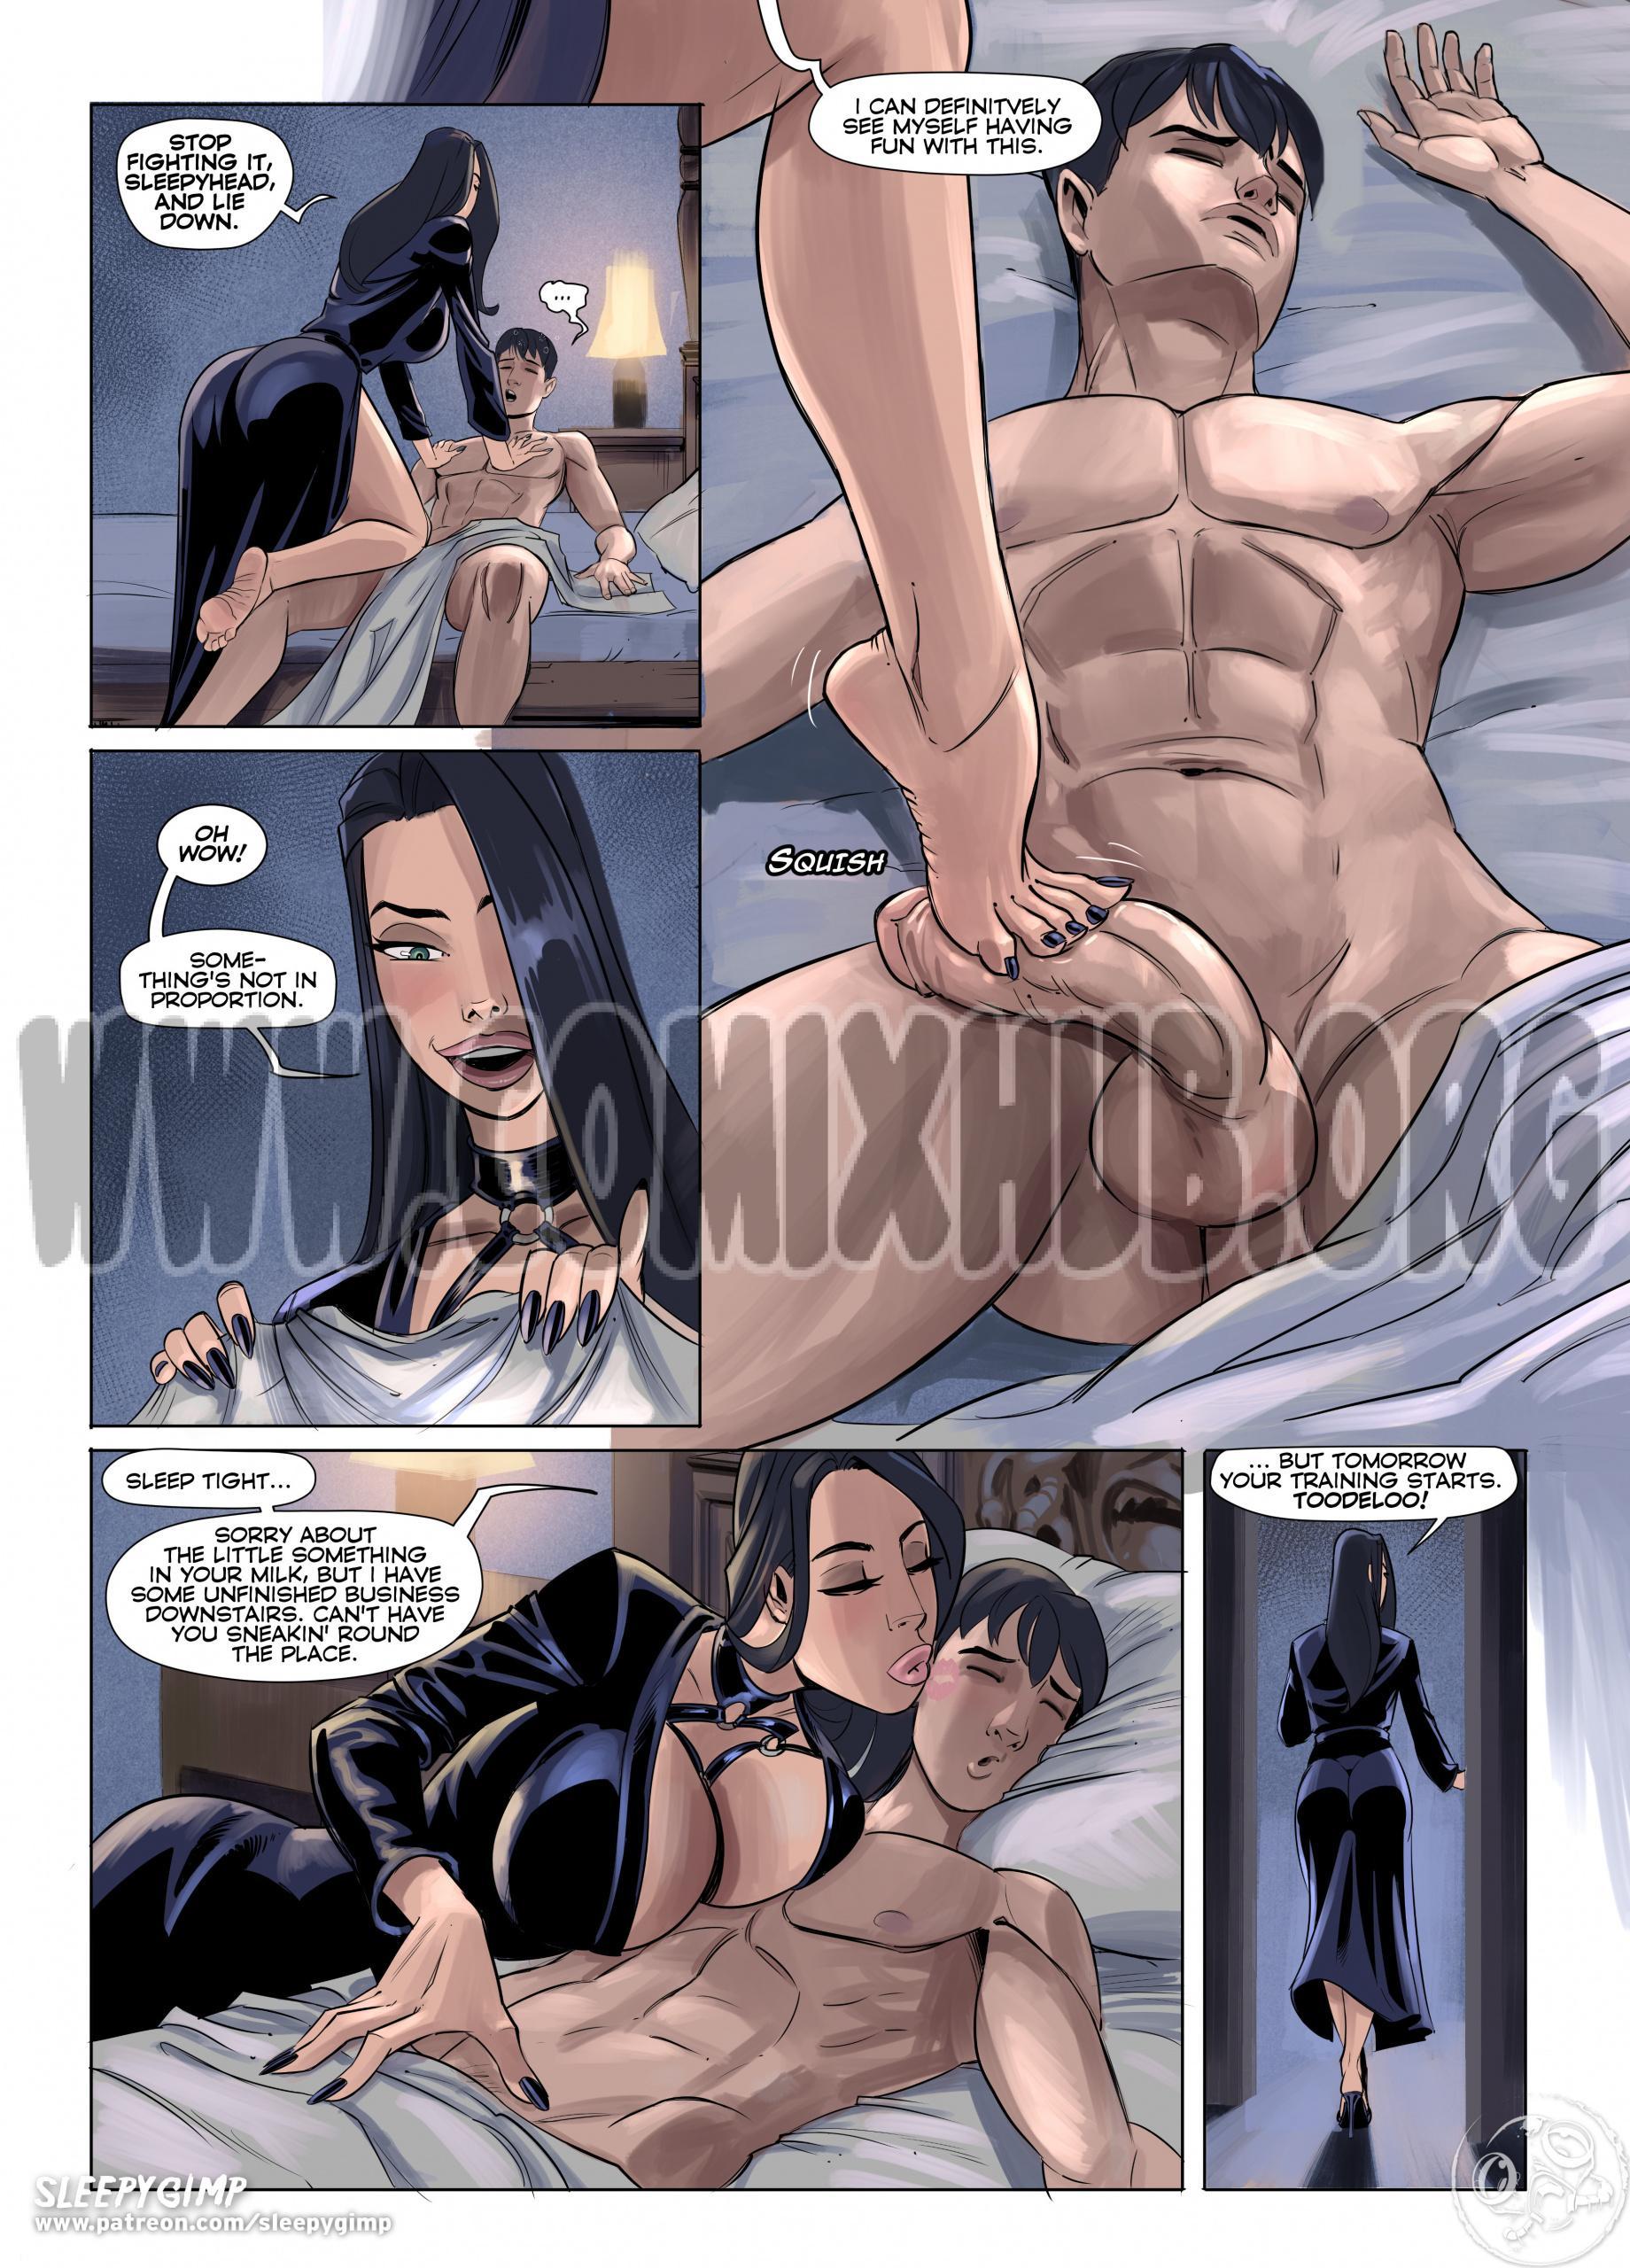 Family Values - SleepyGimp porn comics Anal Sex, BDSM, Big Tits, Femdom, Latex, Sex Toys